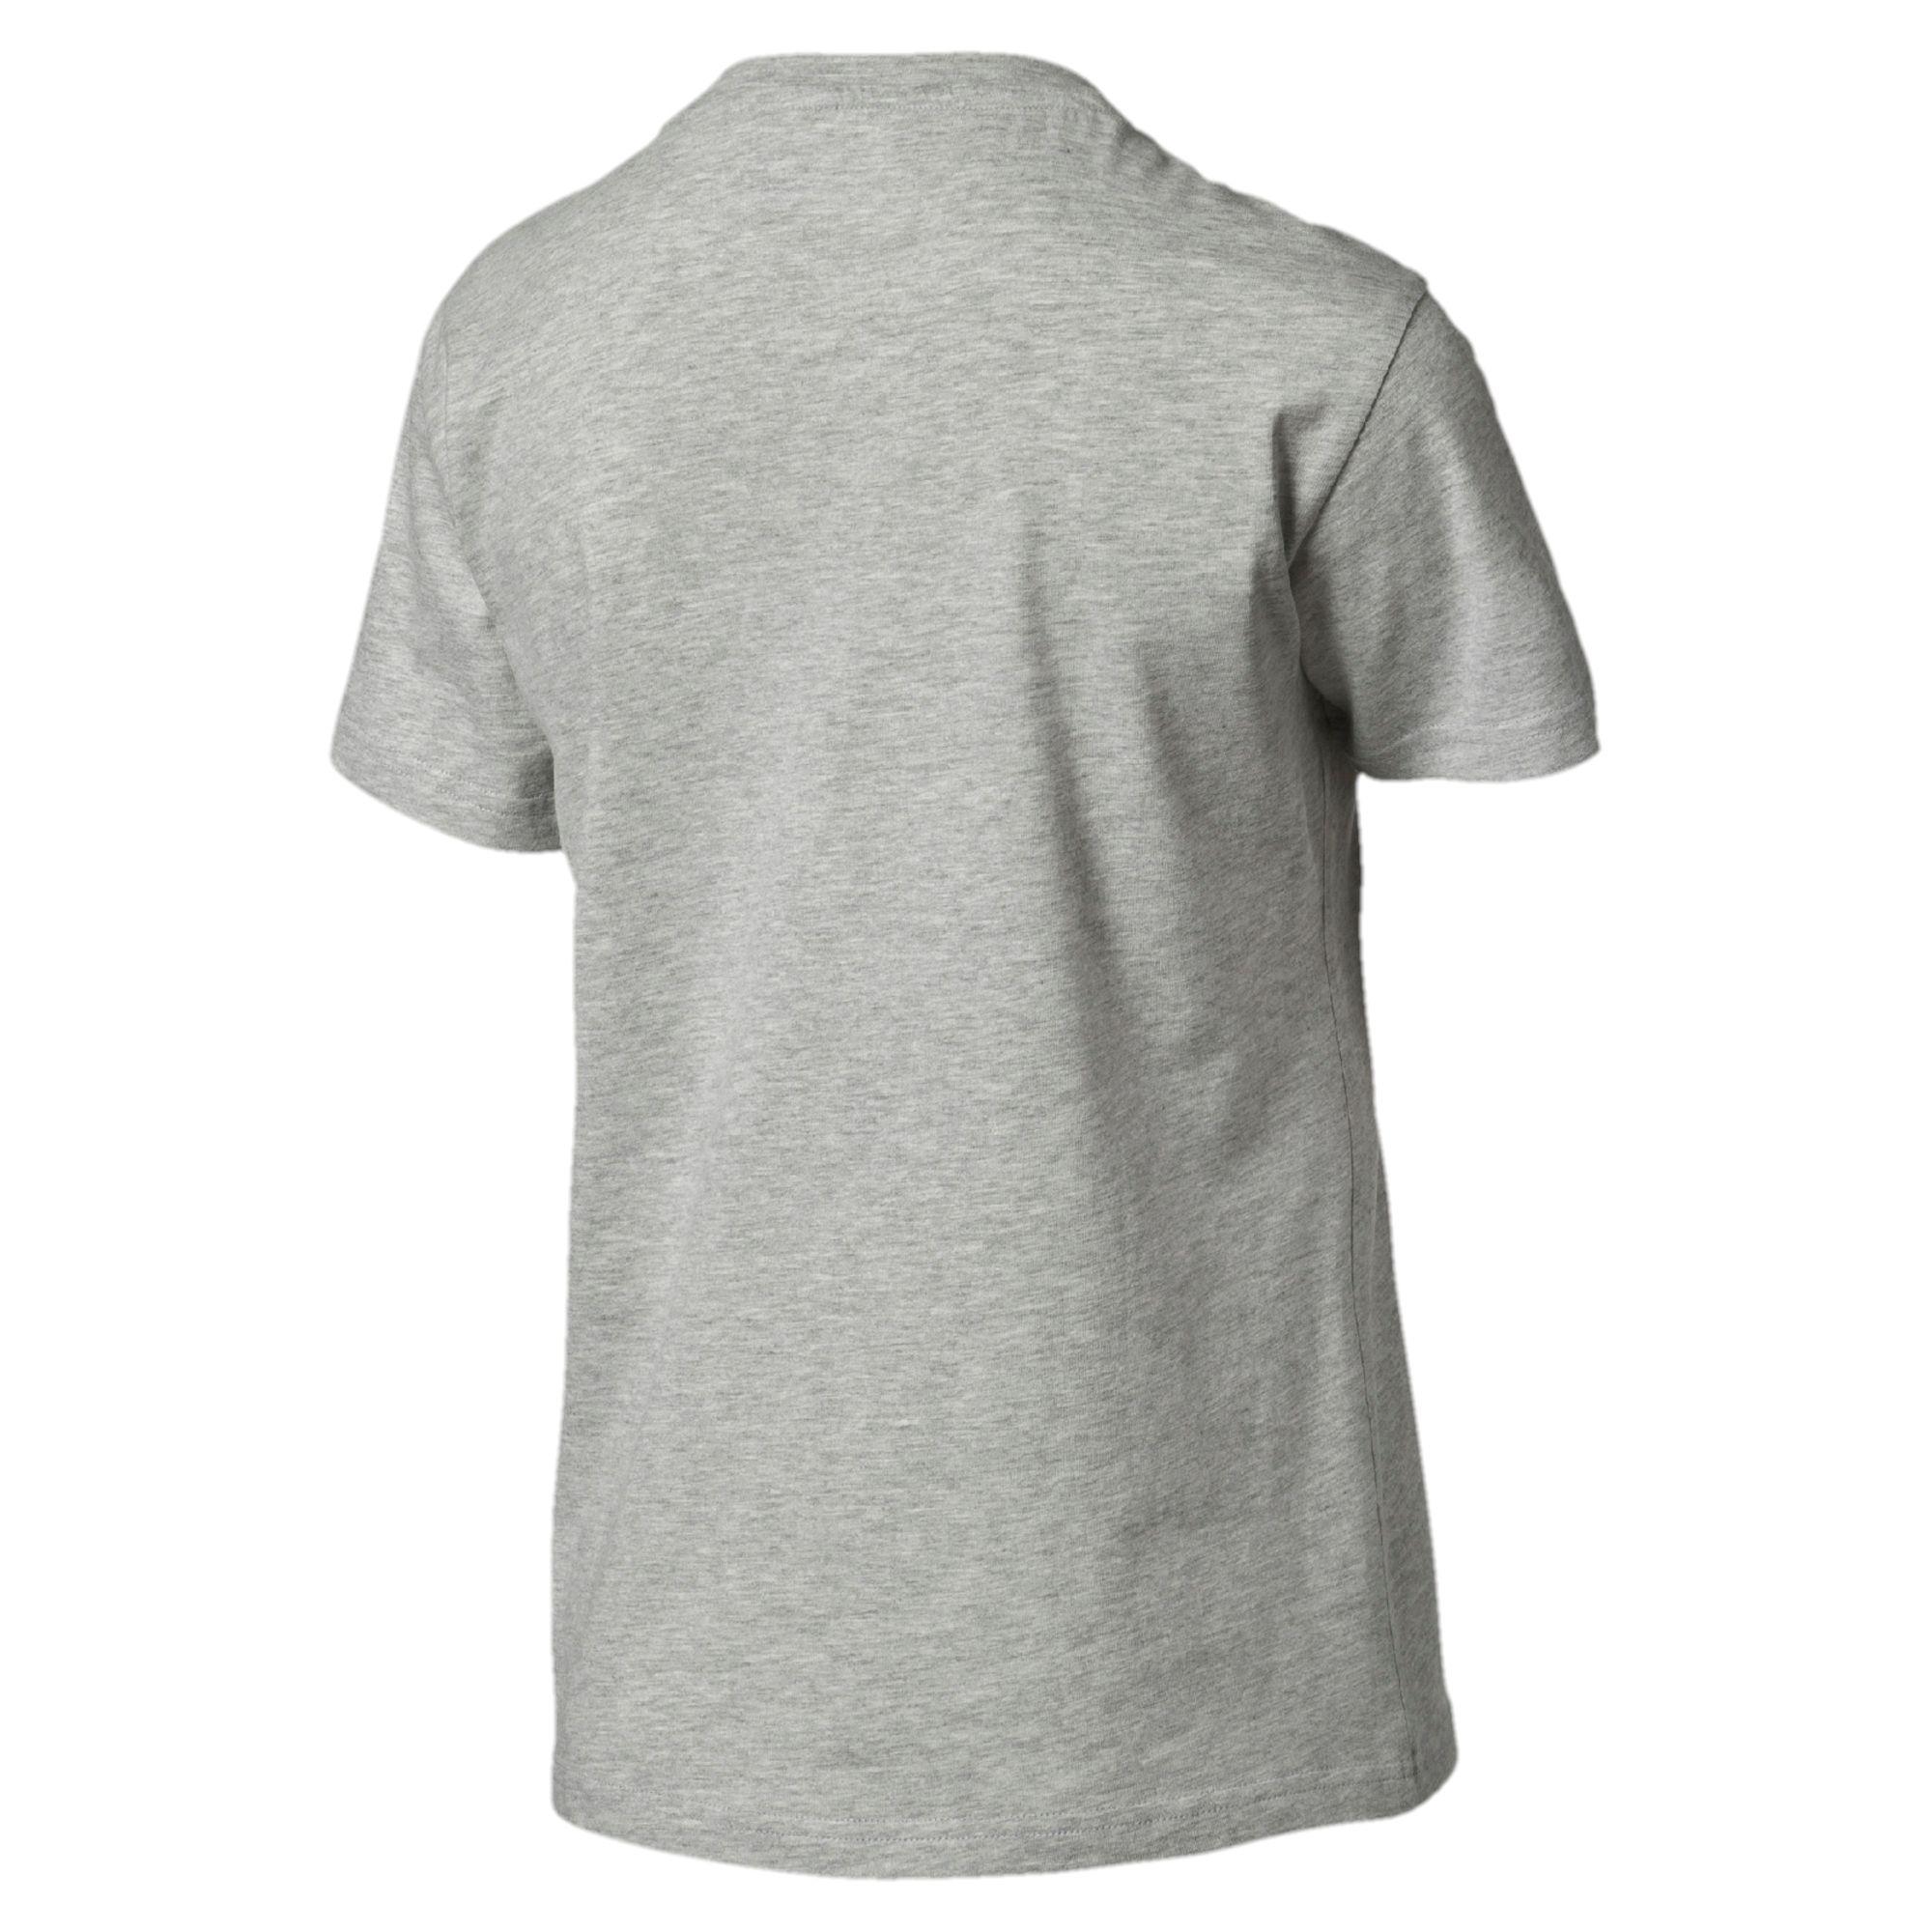 puma archive logo damen t shirt sport classics t shirt frauen neu ebay. Black Bedroom Furniture Sets. Home Design Ideas